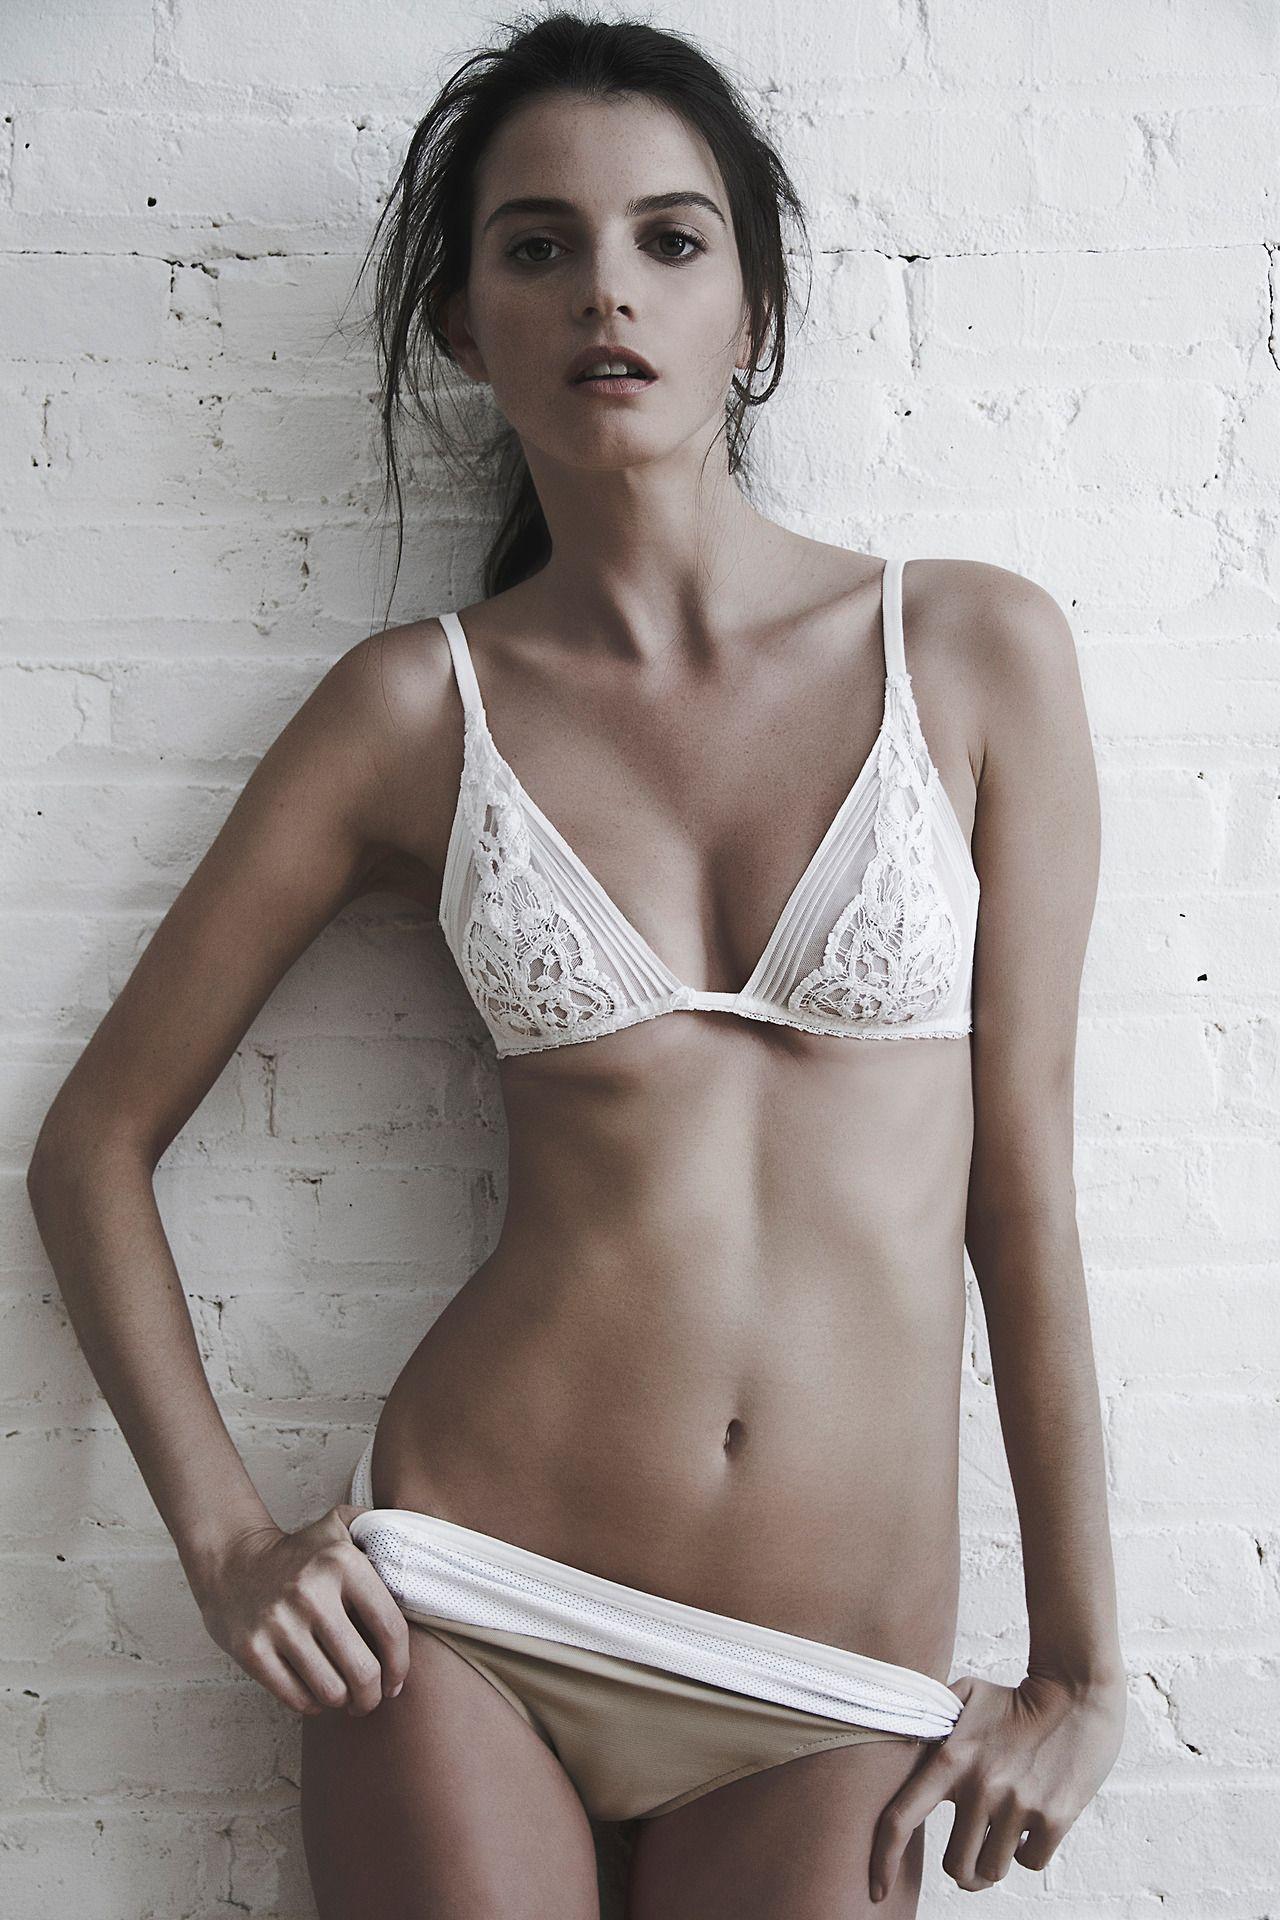 jwanderprivate: Jeisa Chiminazzo | .1 | Pinterest | Anatomía humana ...